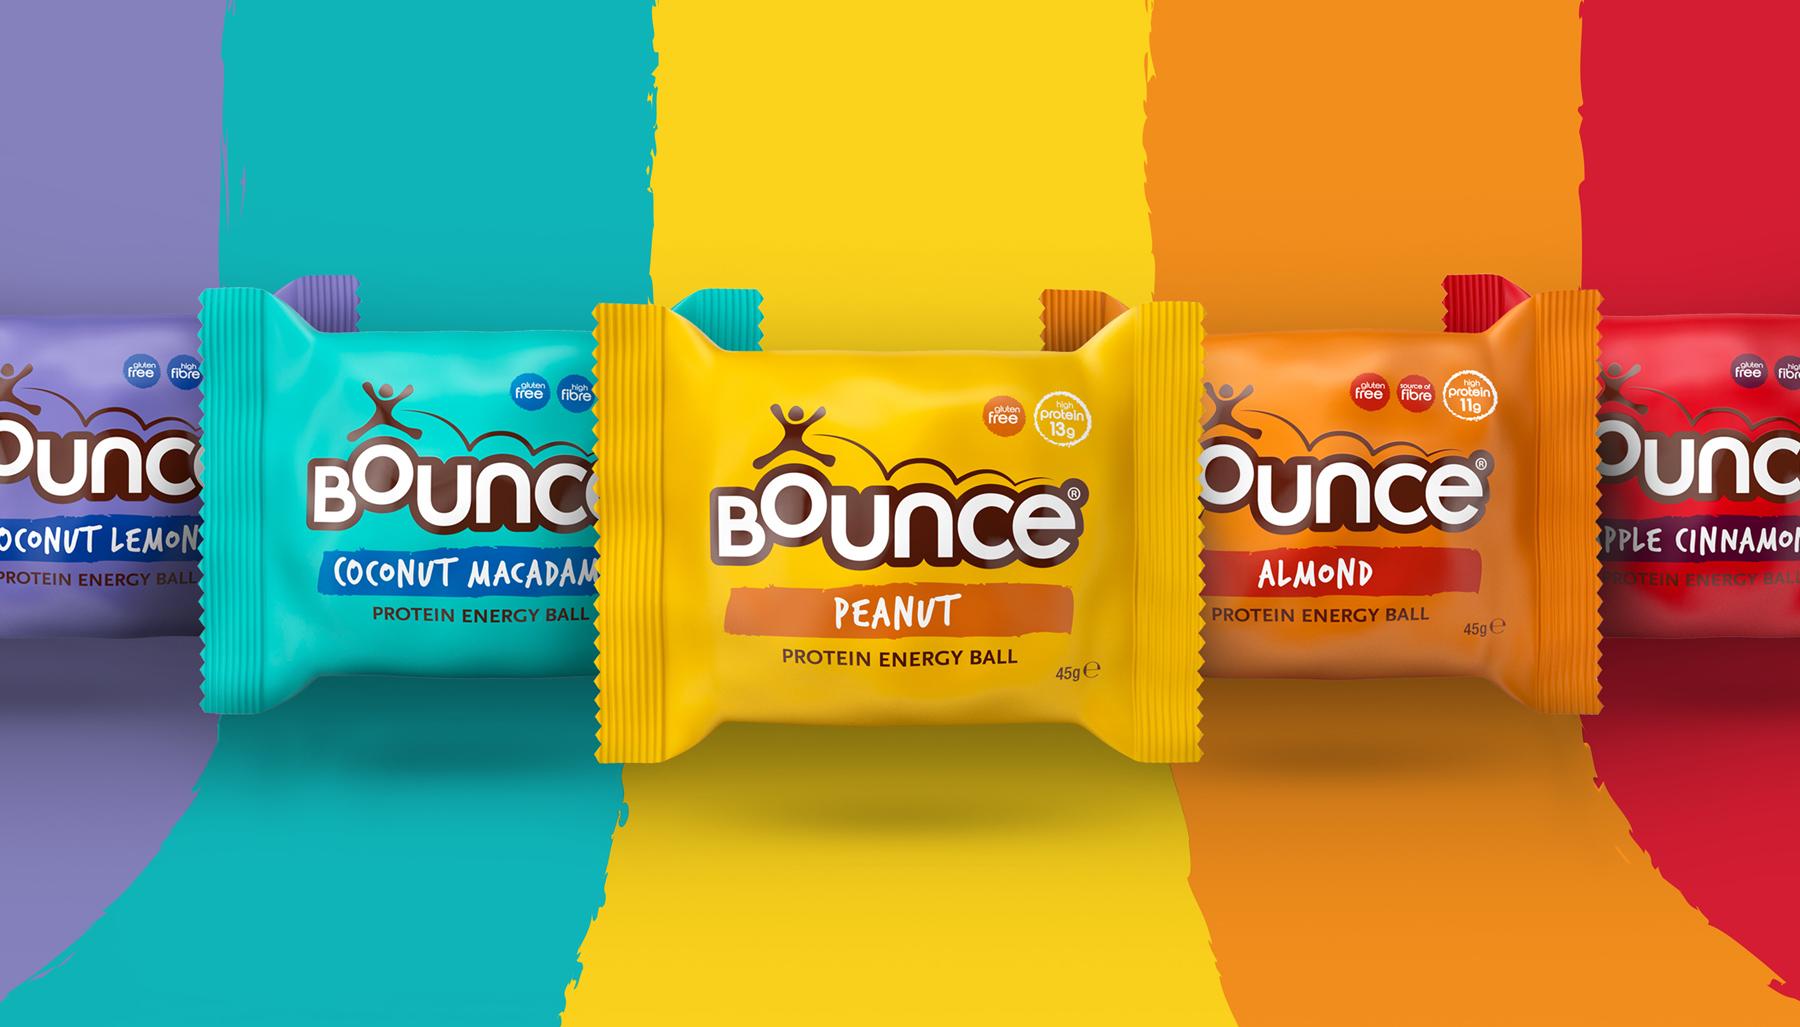 Award-winning packaging design for Bounce product range